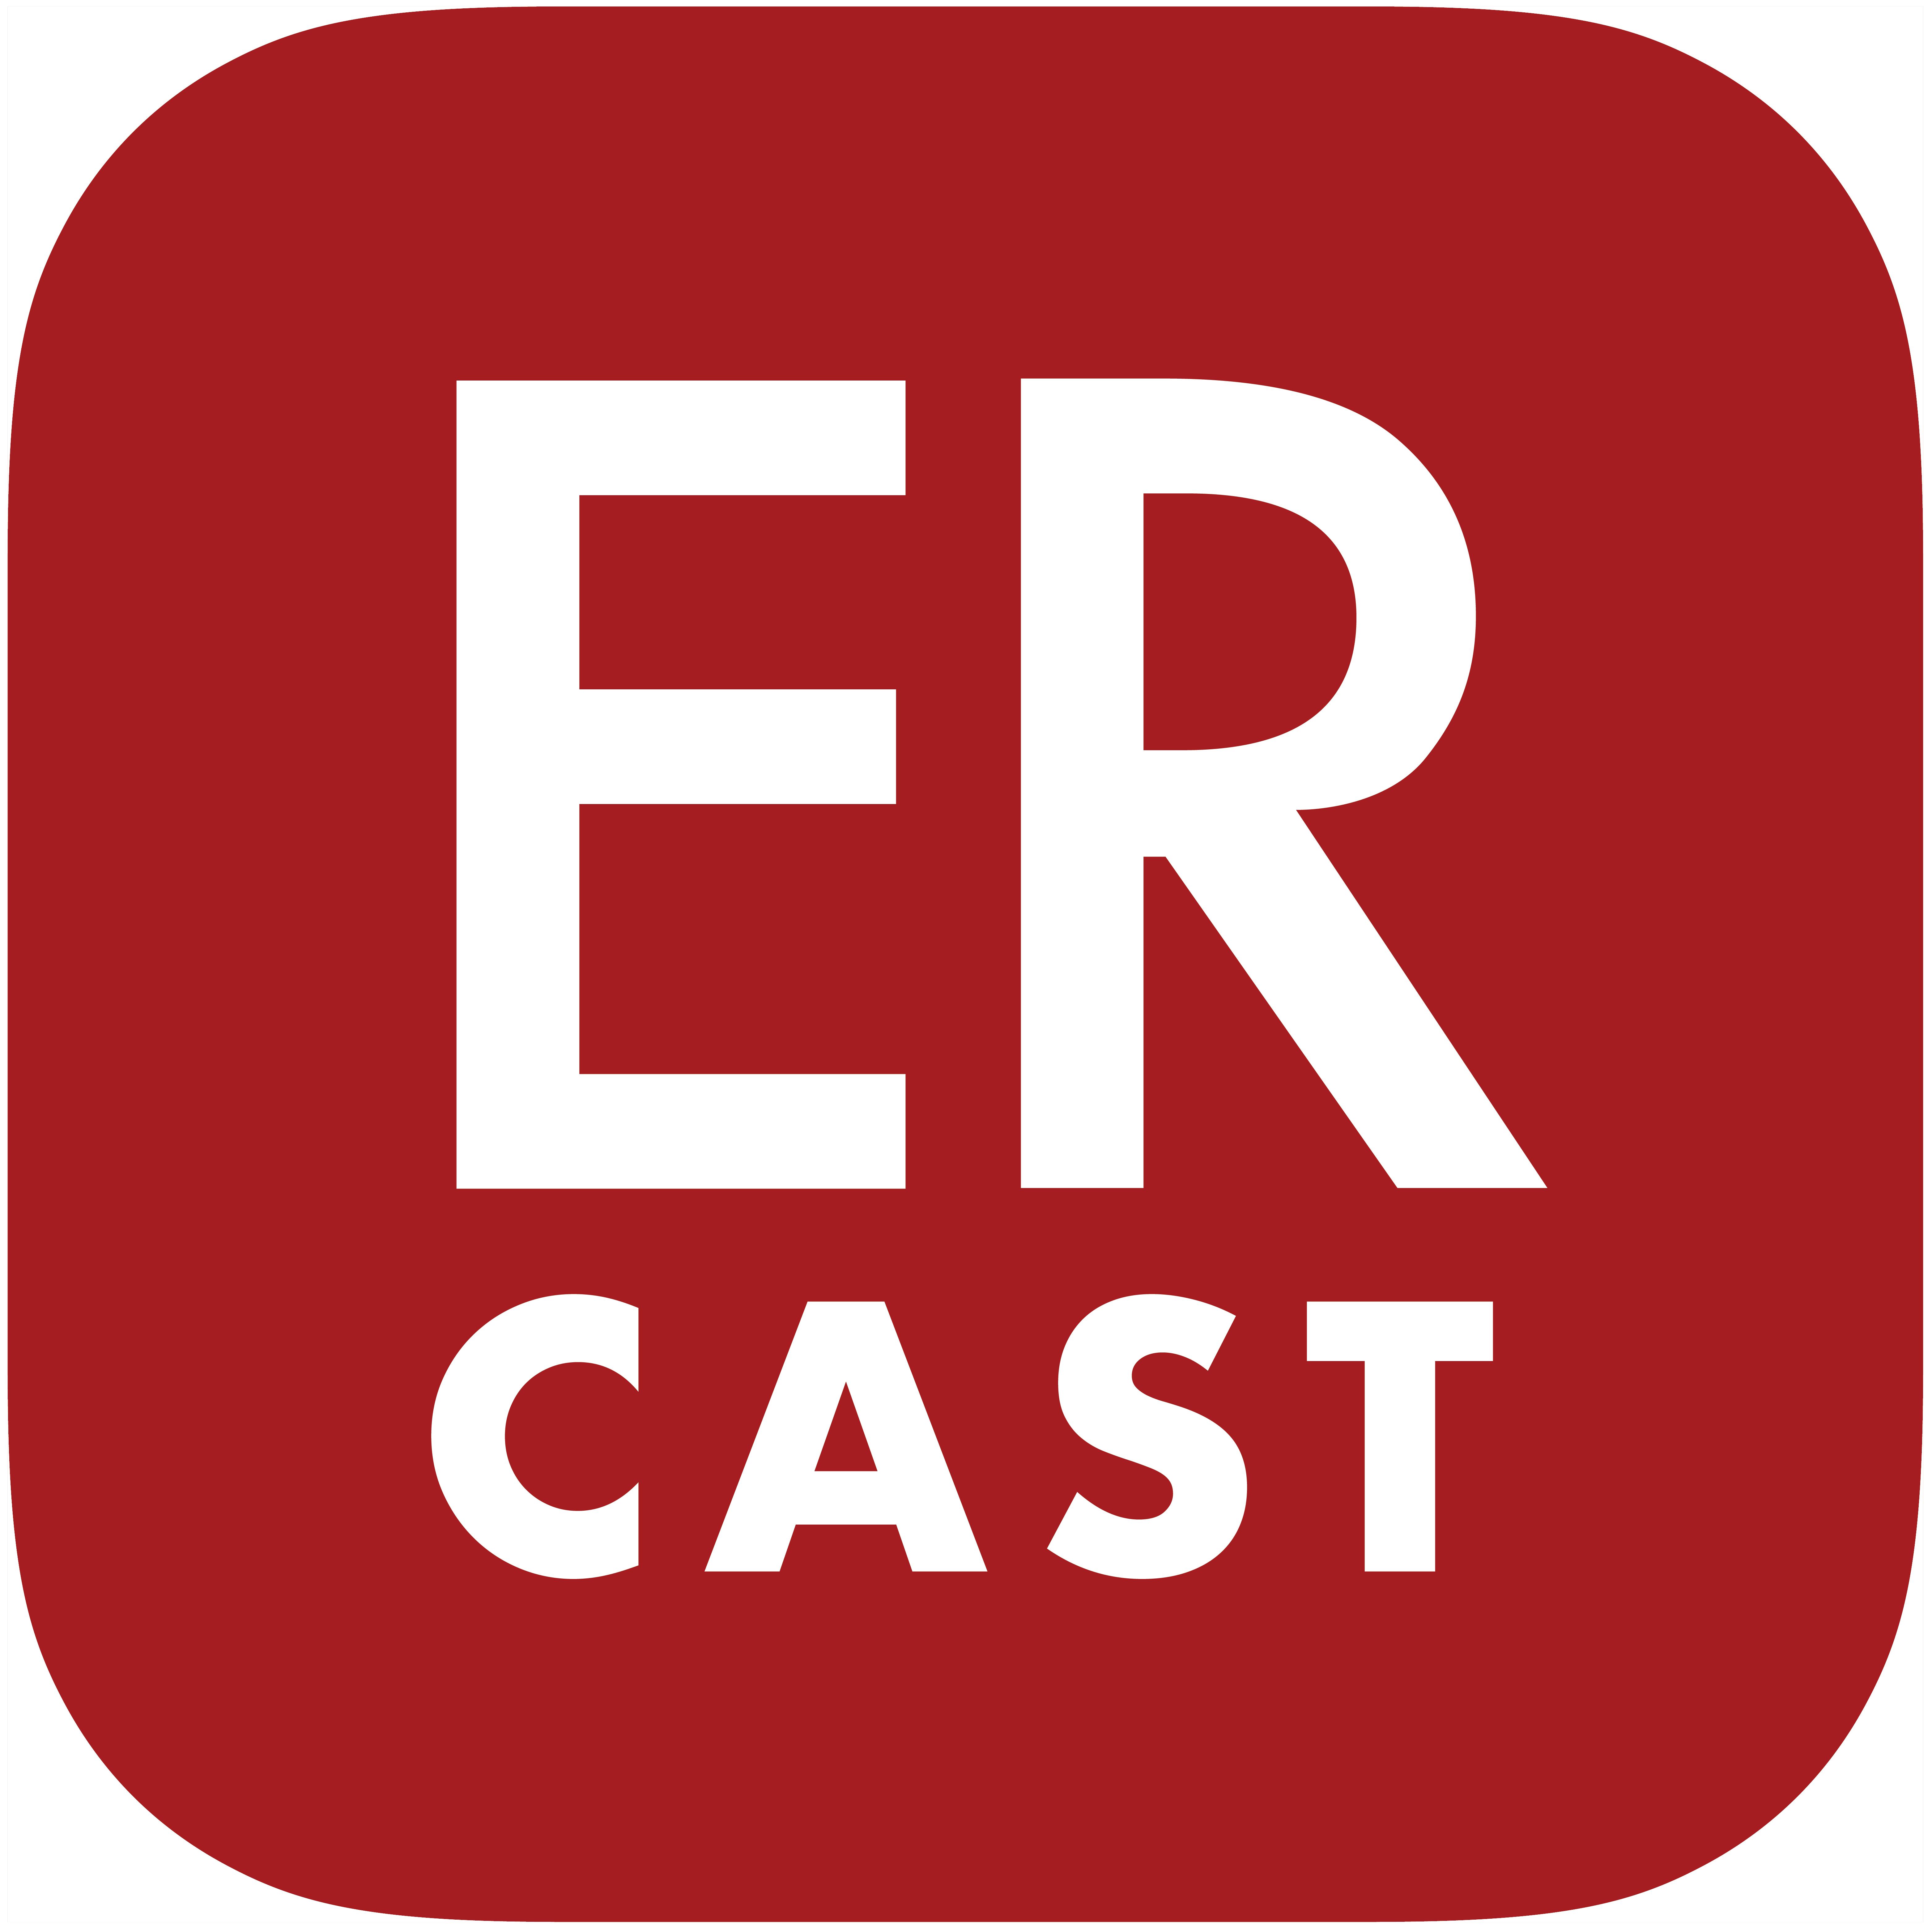 ERCAST | Podbay